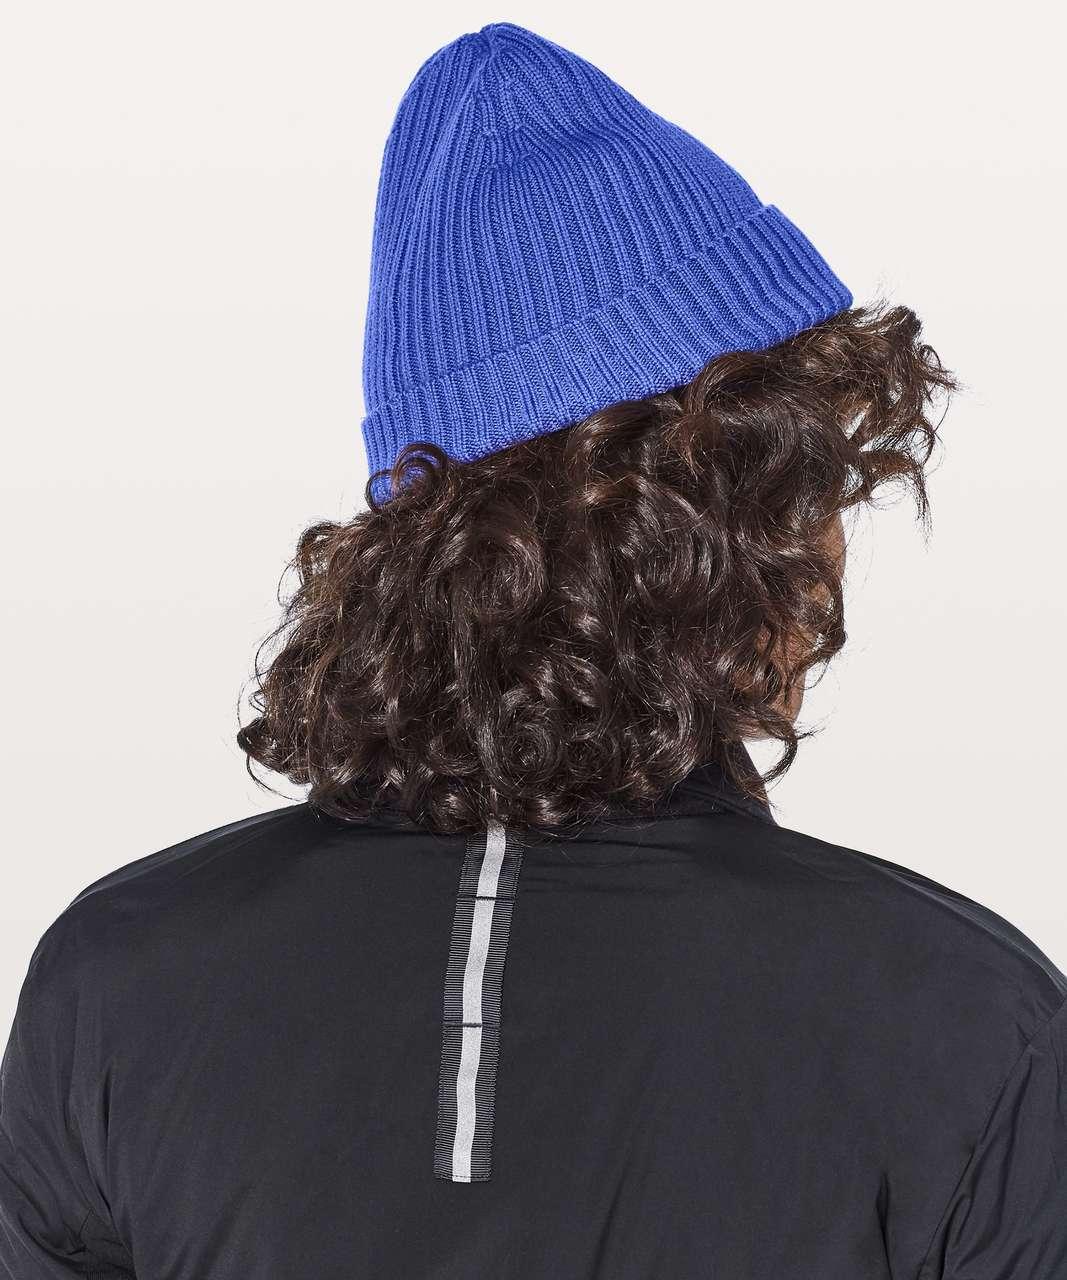 Lululemon Wool Be Cozy Toque - Blazer Blue